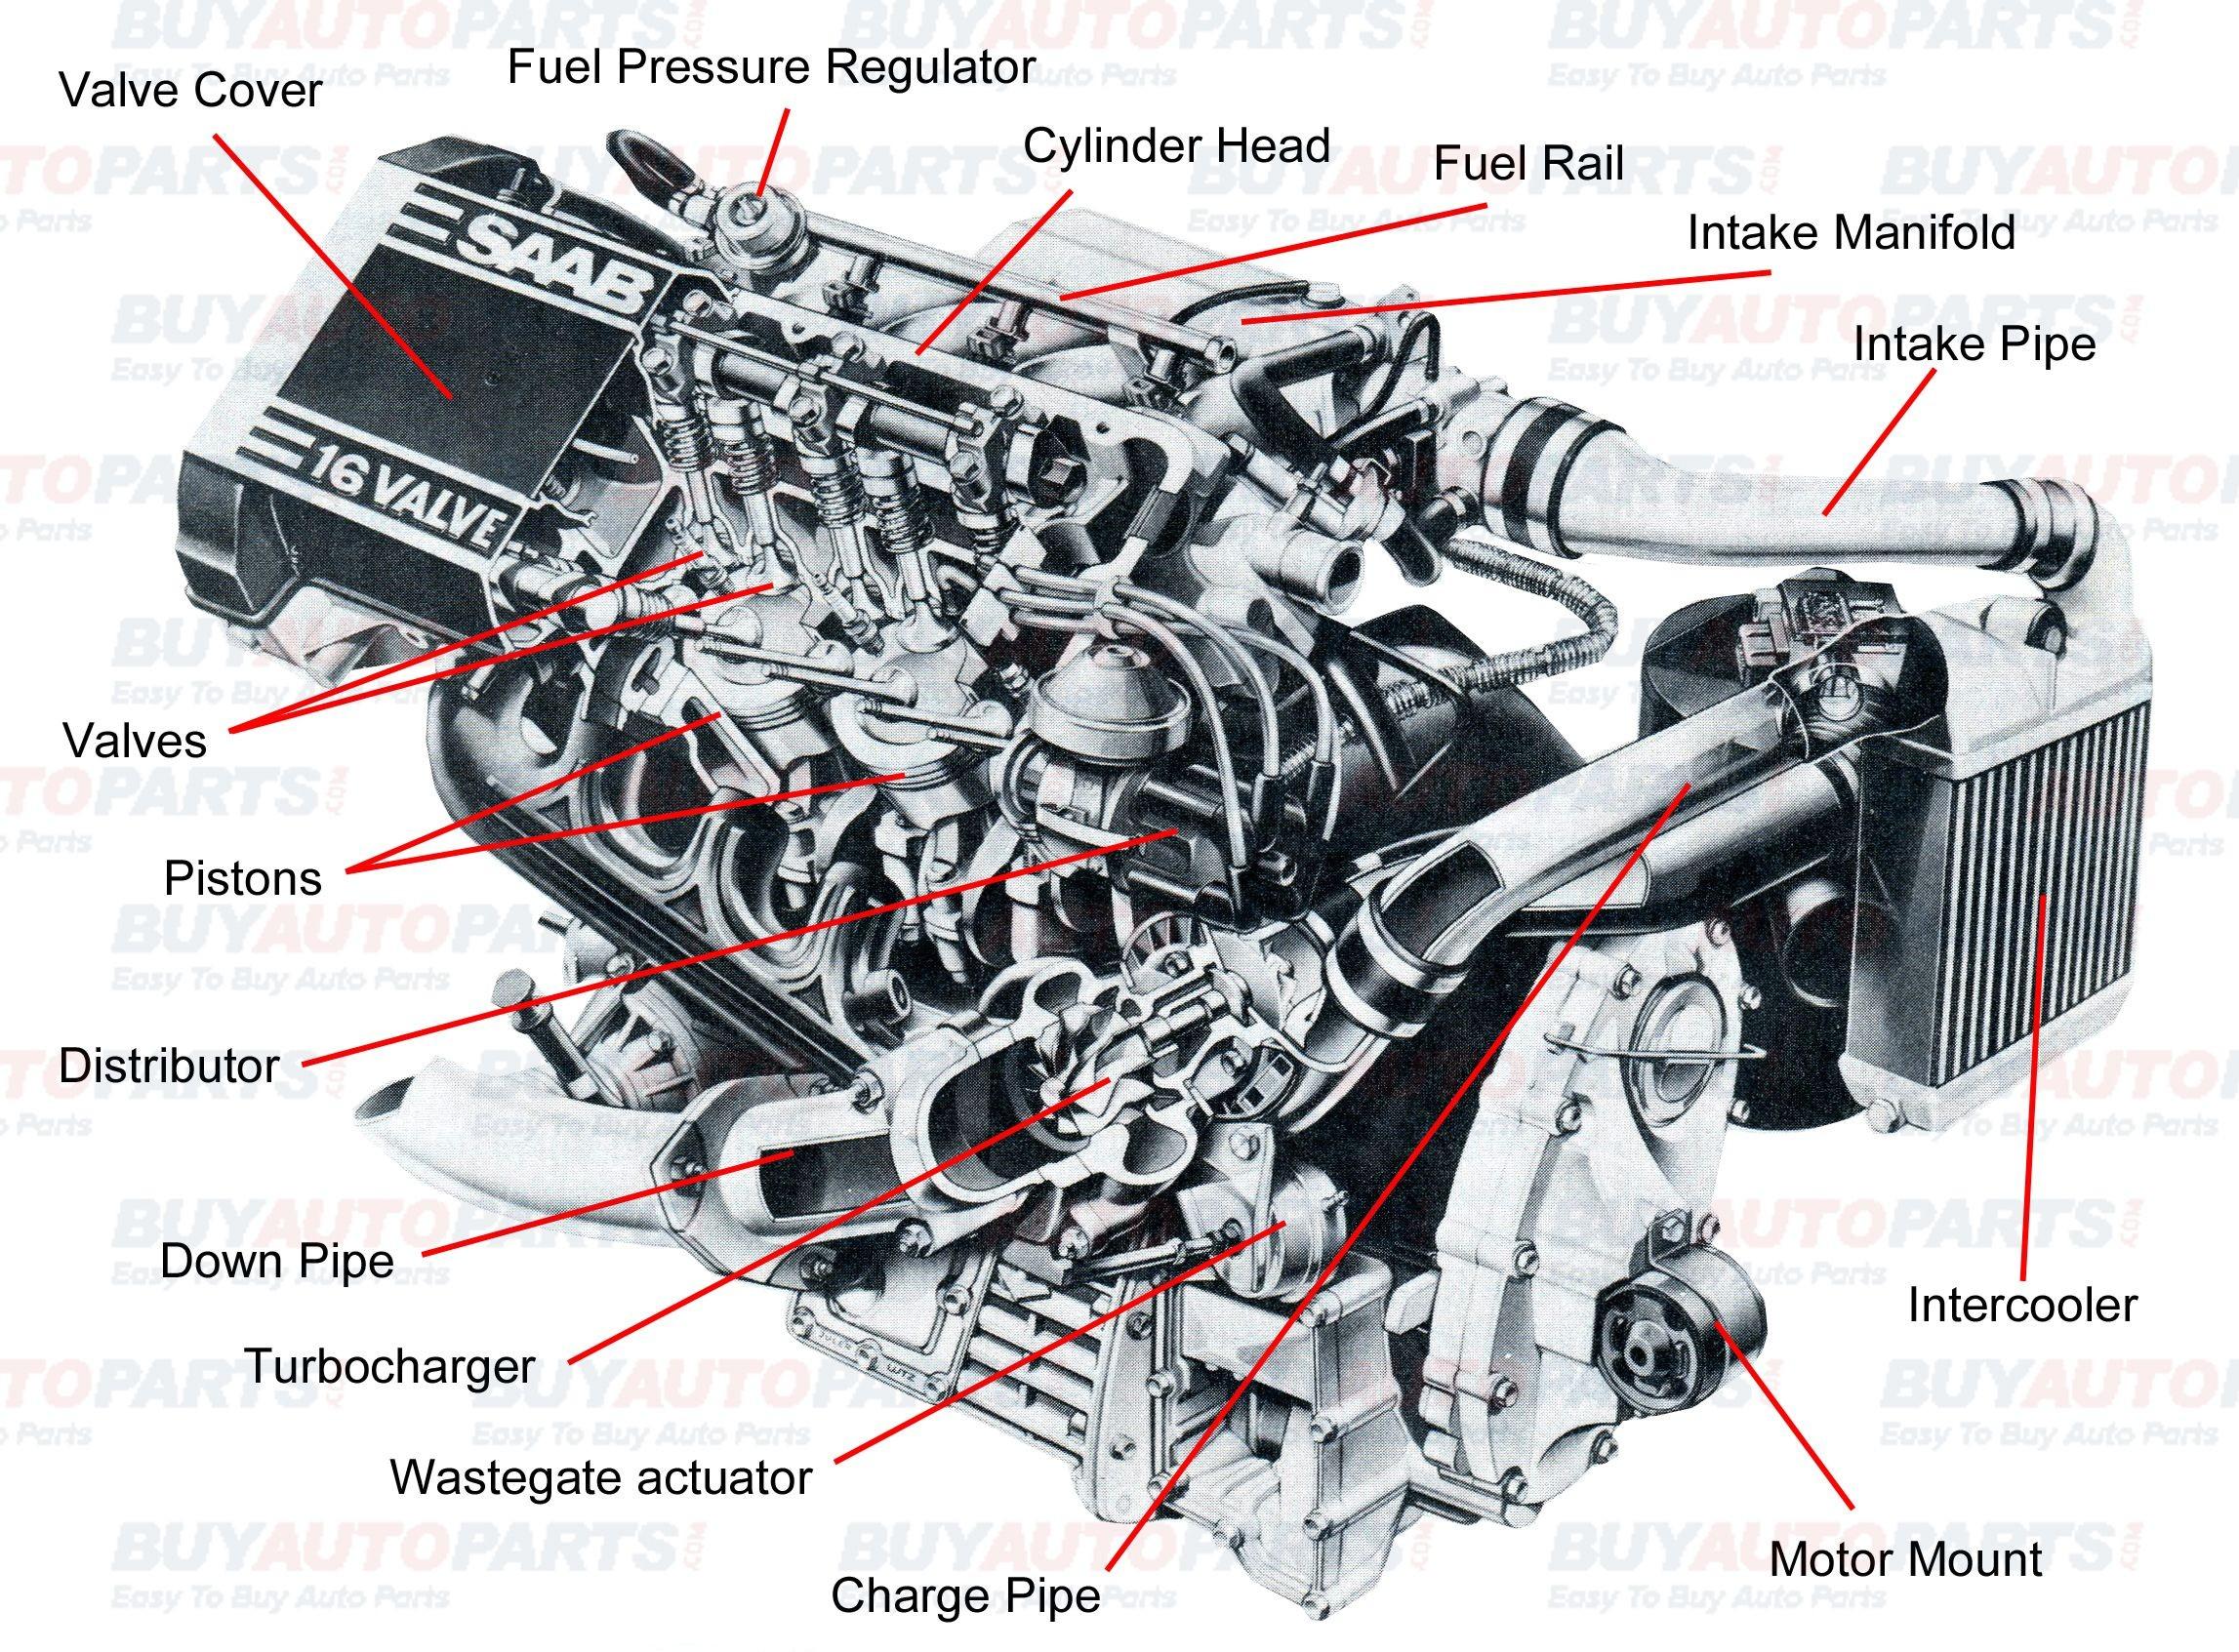 how does a combustion engine work diagram all internal bustion engines have the same basic. Black Bedroom Furniture Sets. Home Design Ideas